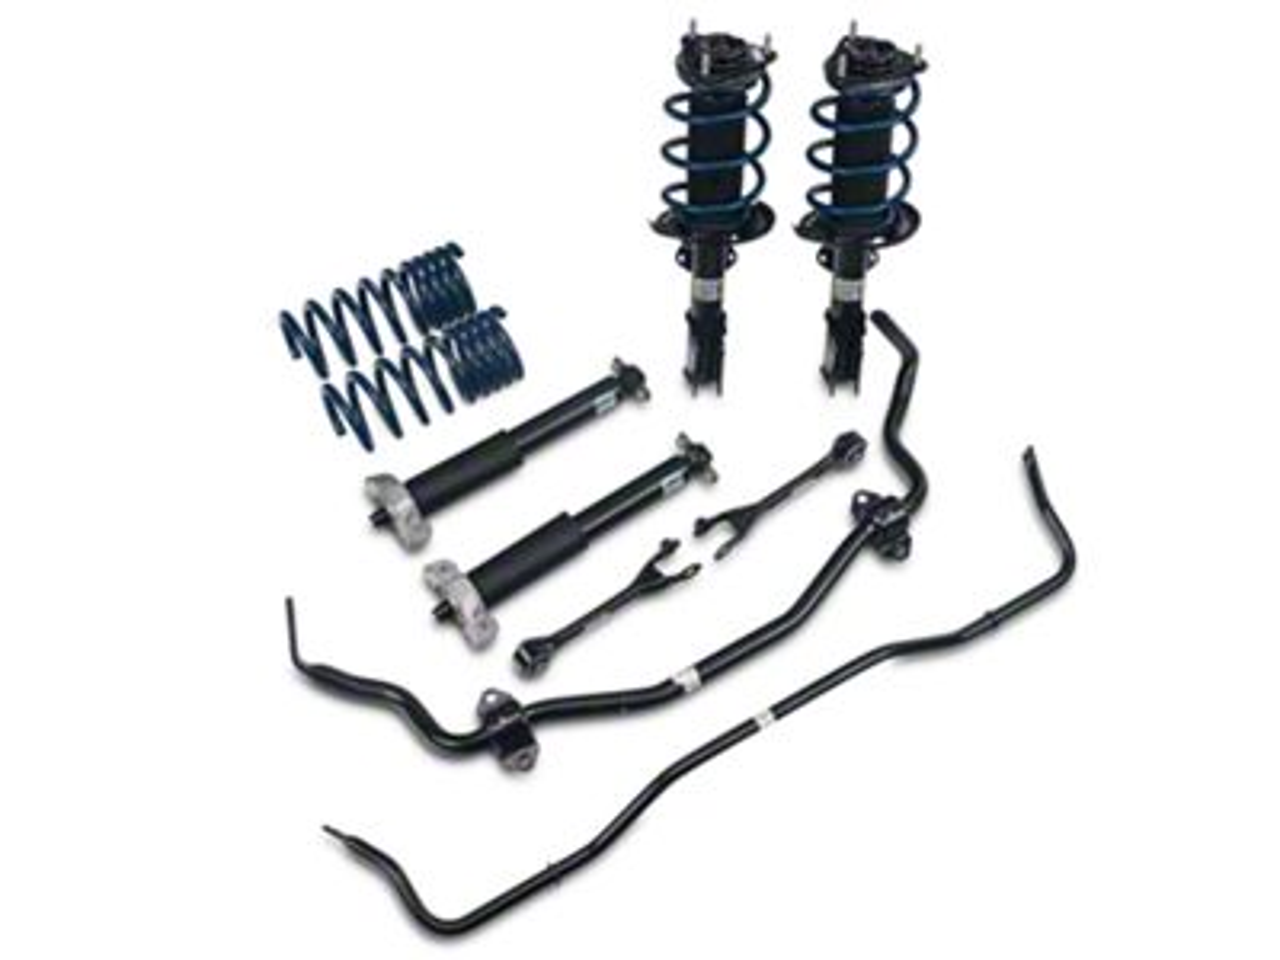 Ford Performance Street Handling Pack (15-19 GT Fastback w/o MagneRide, EcoBoost Fastback w/o MagneRide)